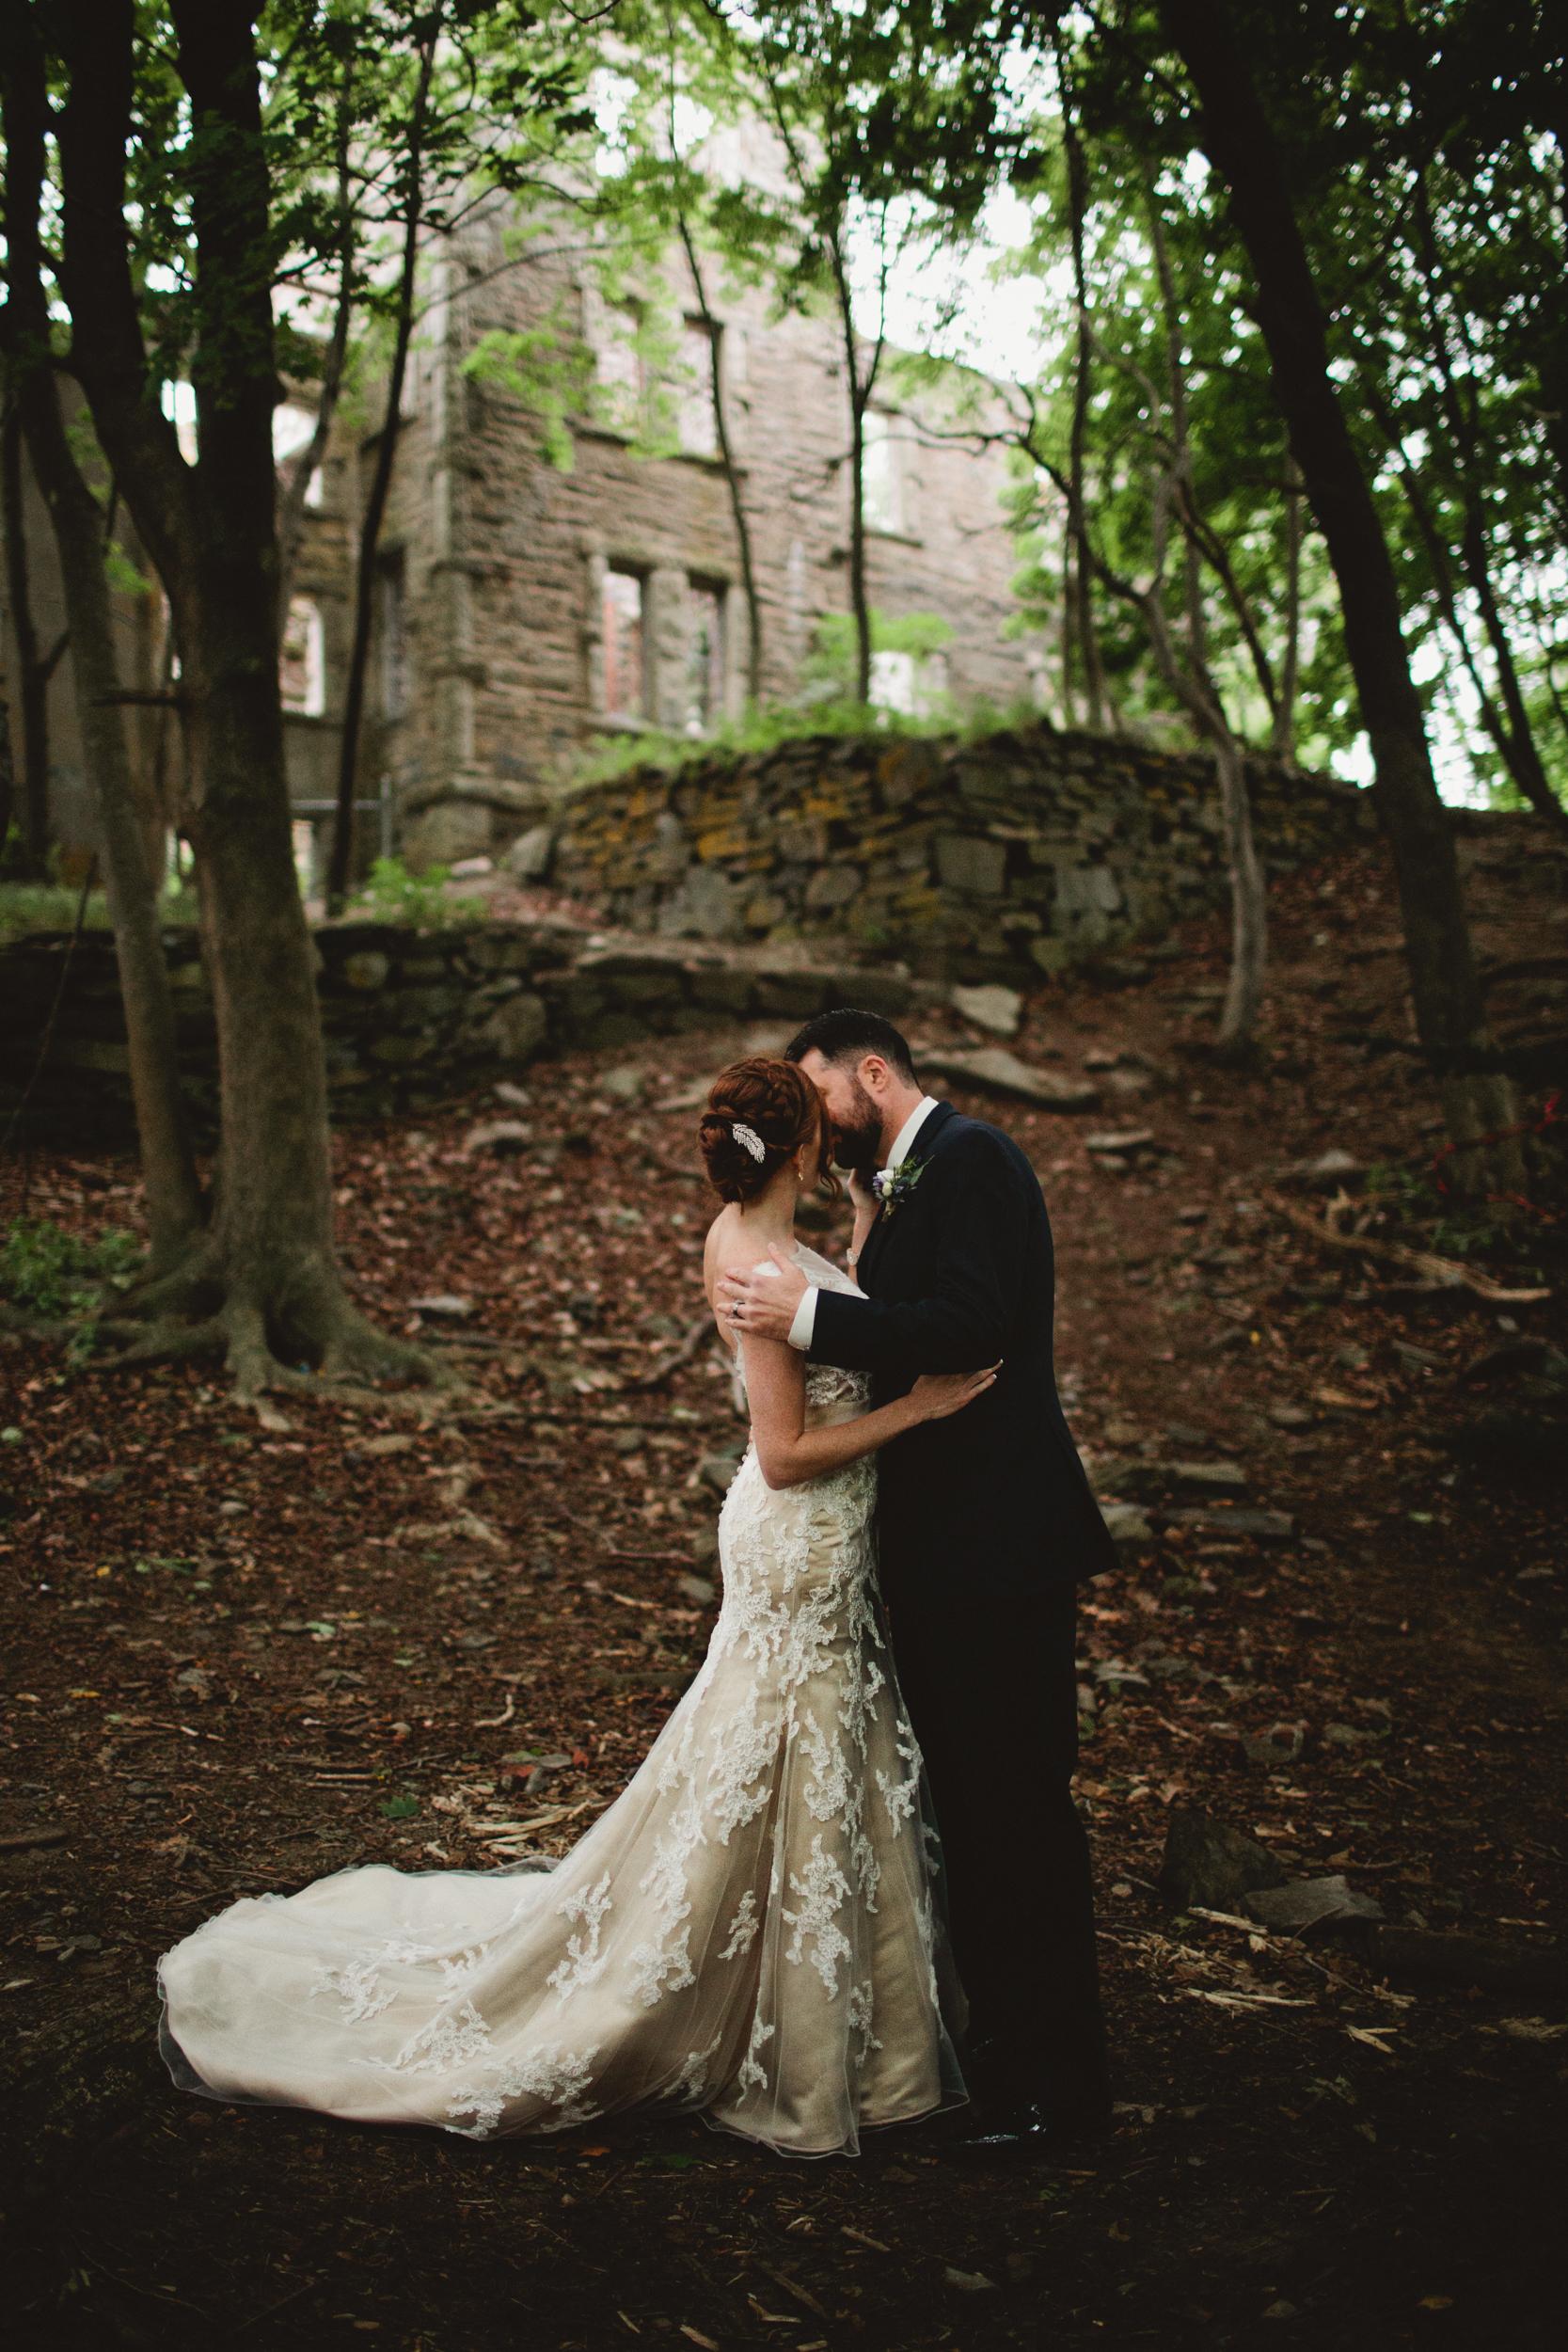 Portland-Maine-Wedding-33.jpg